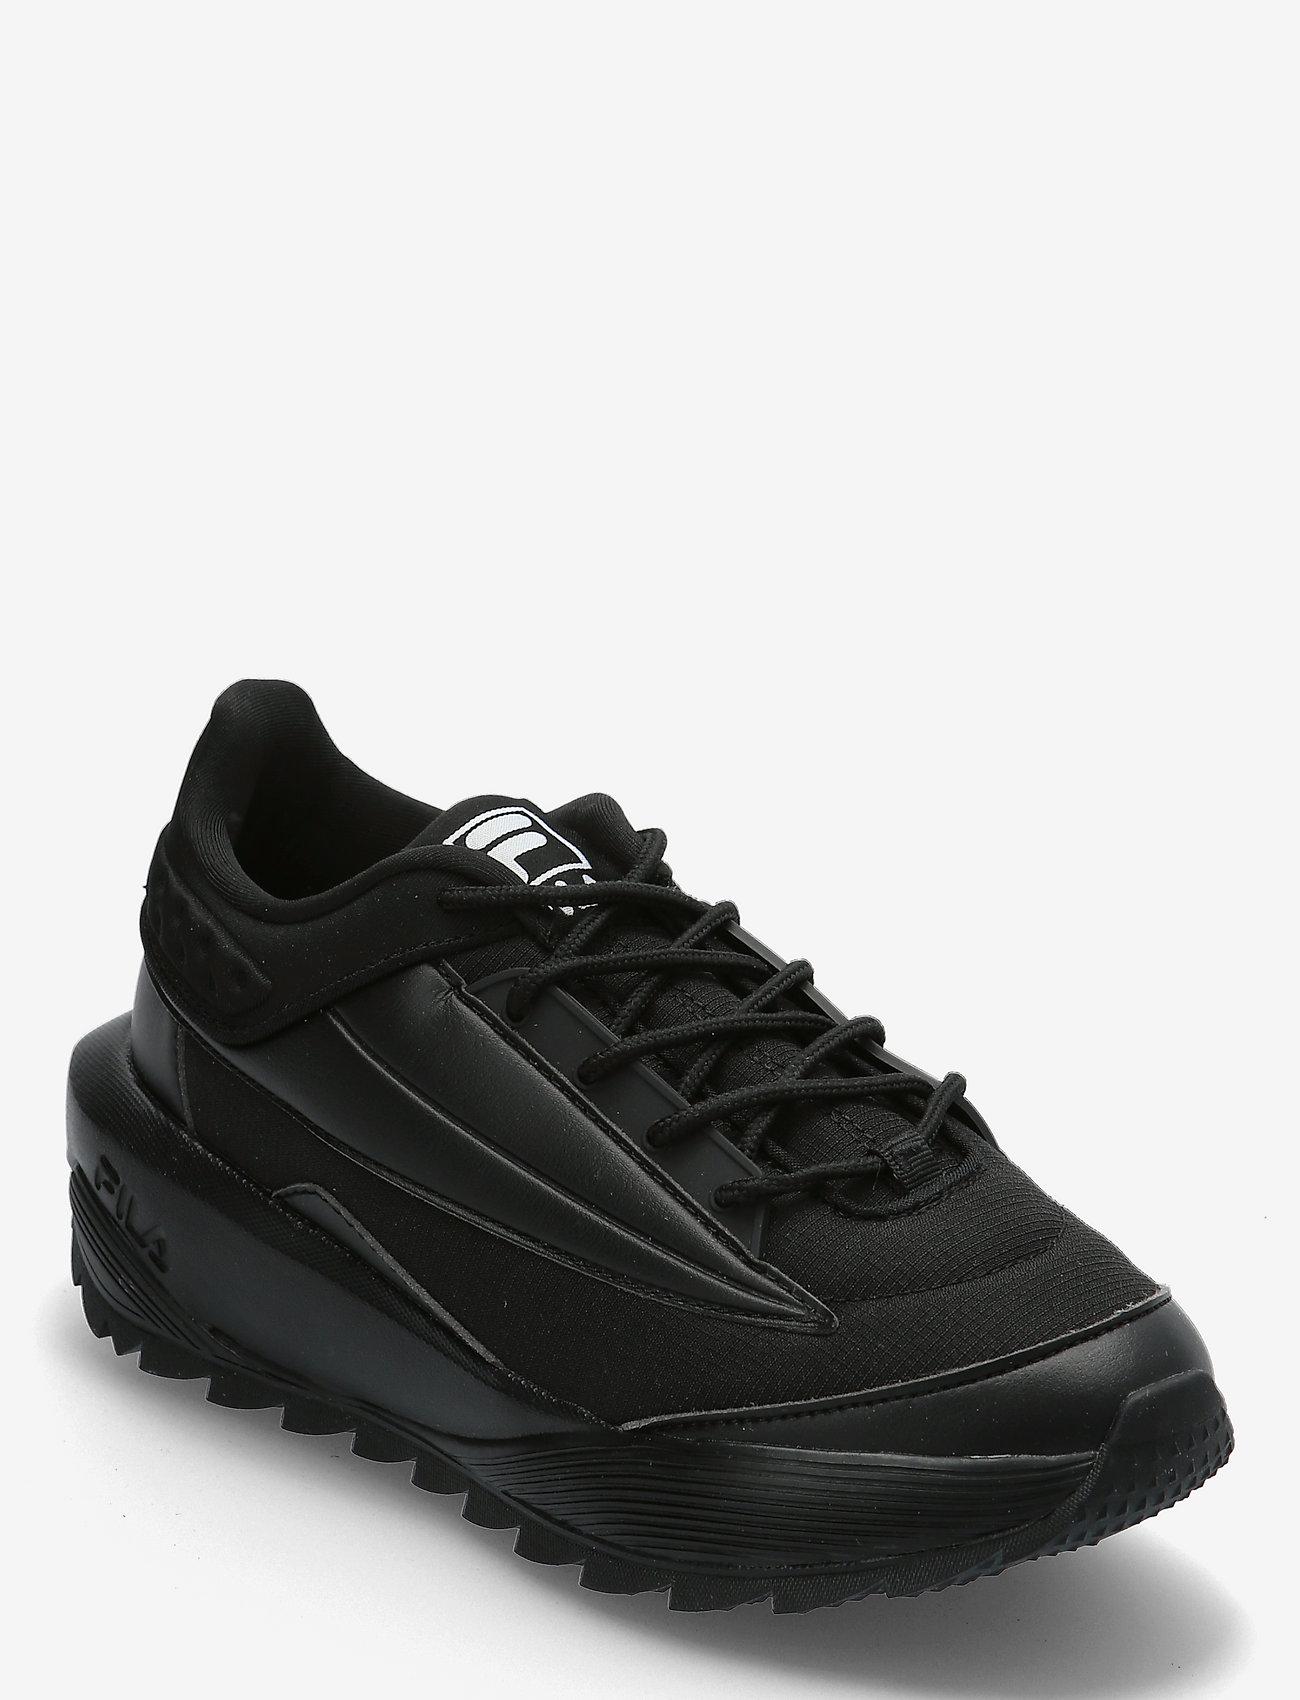 FILA - Throcket wmn - baskets épaisses - black / black - 0